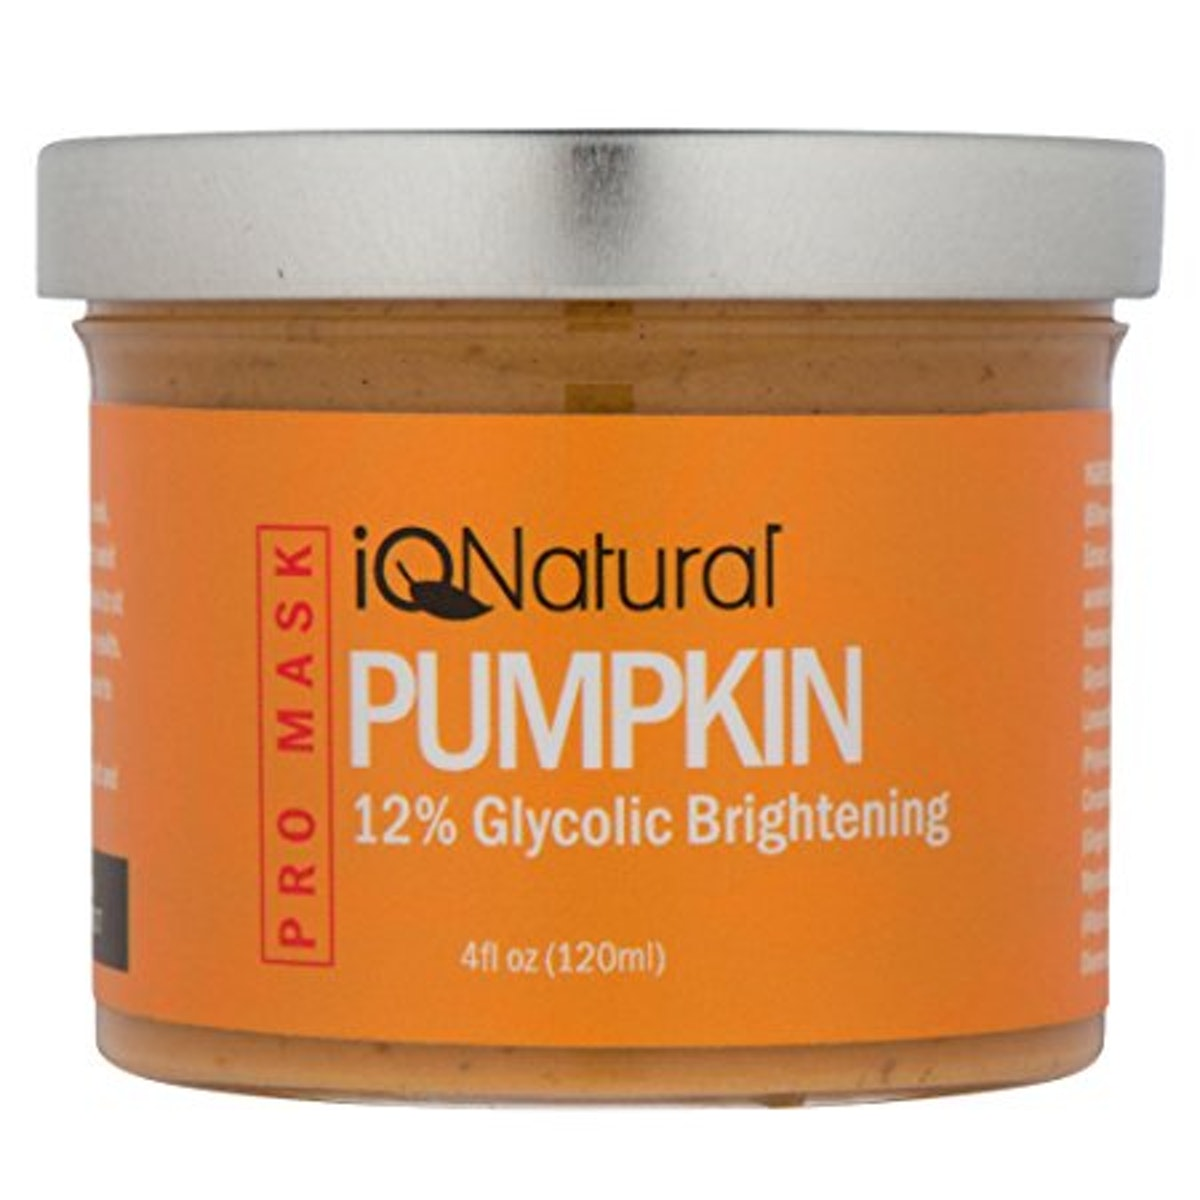 Organic Pumpkin Enzyme Facial Peel Mask